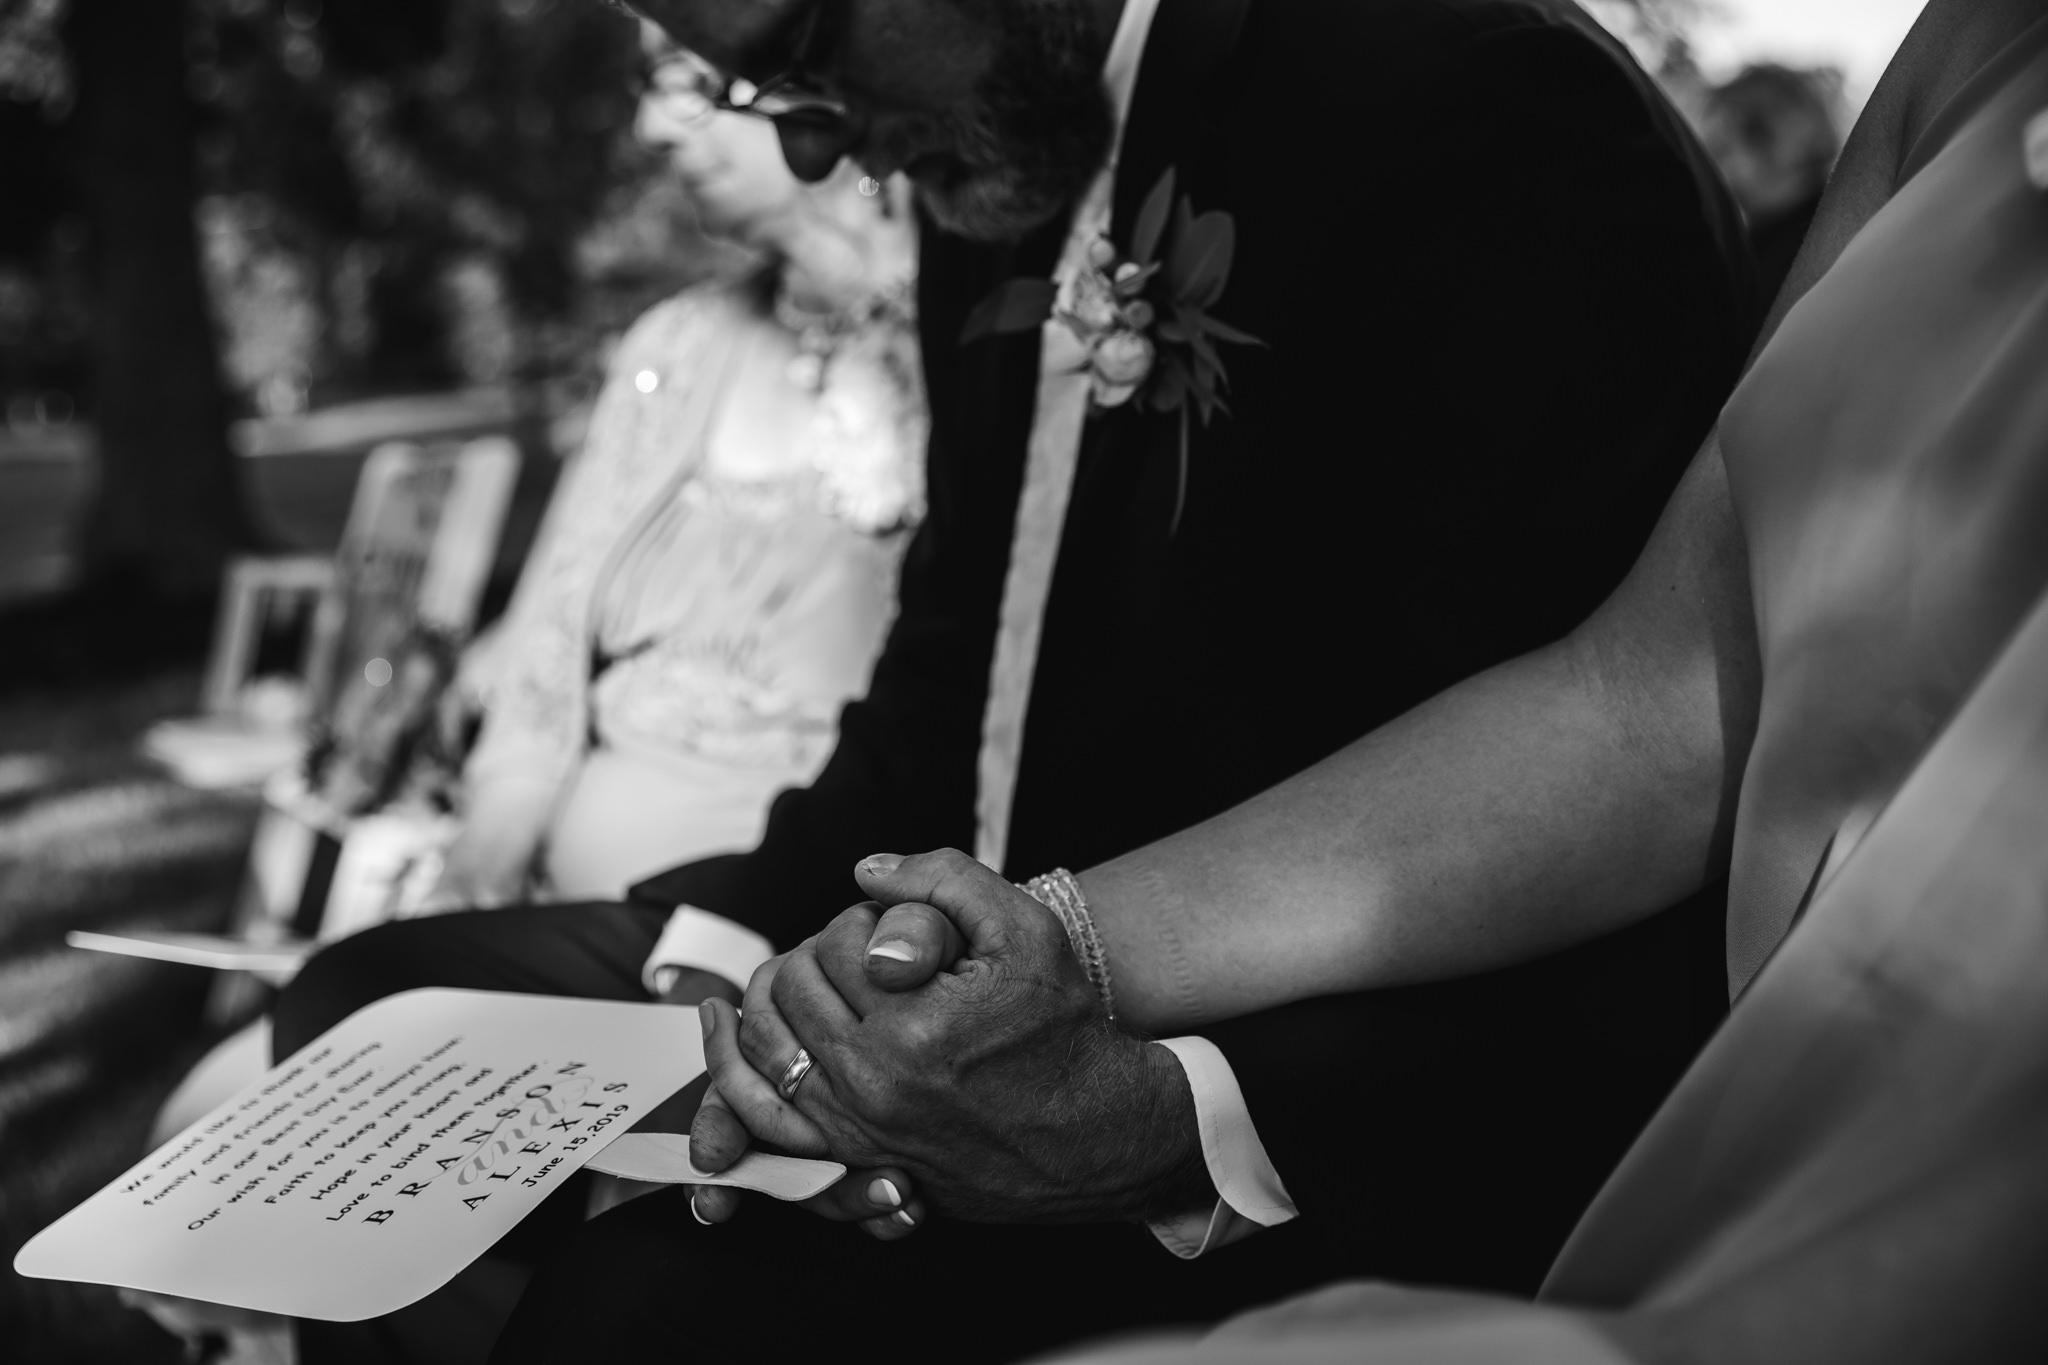 zbackyard-wedding-thewarmtharoundyou-lexy-branson-406.jpg